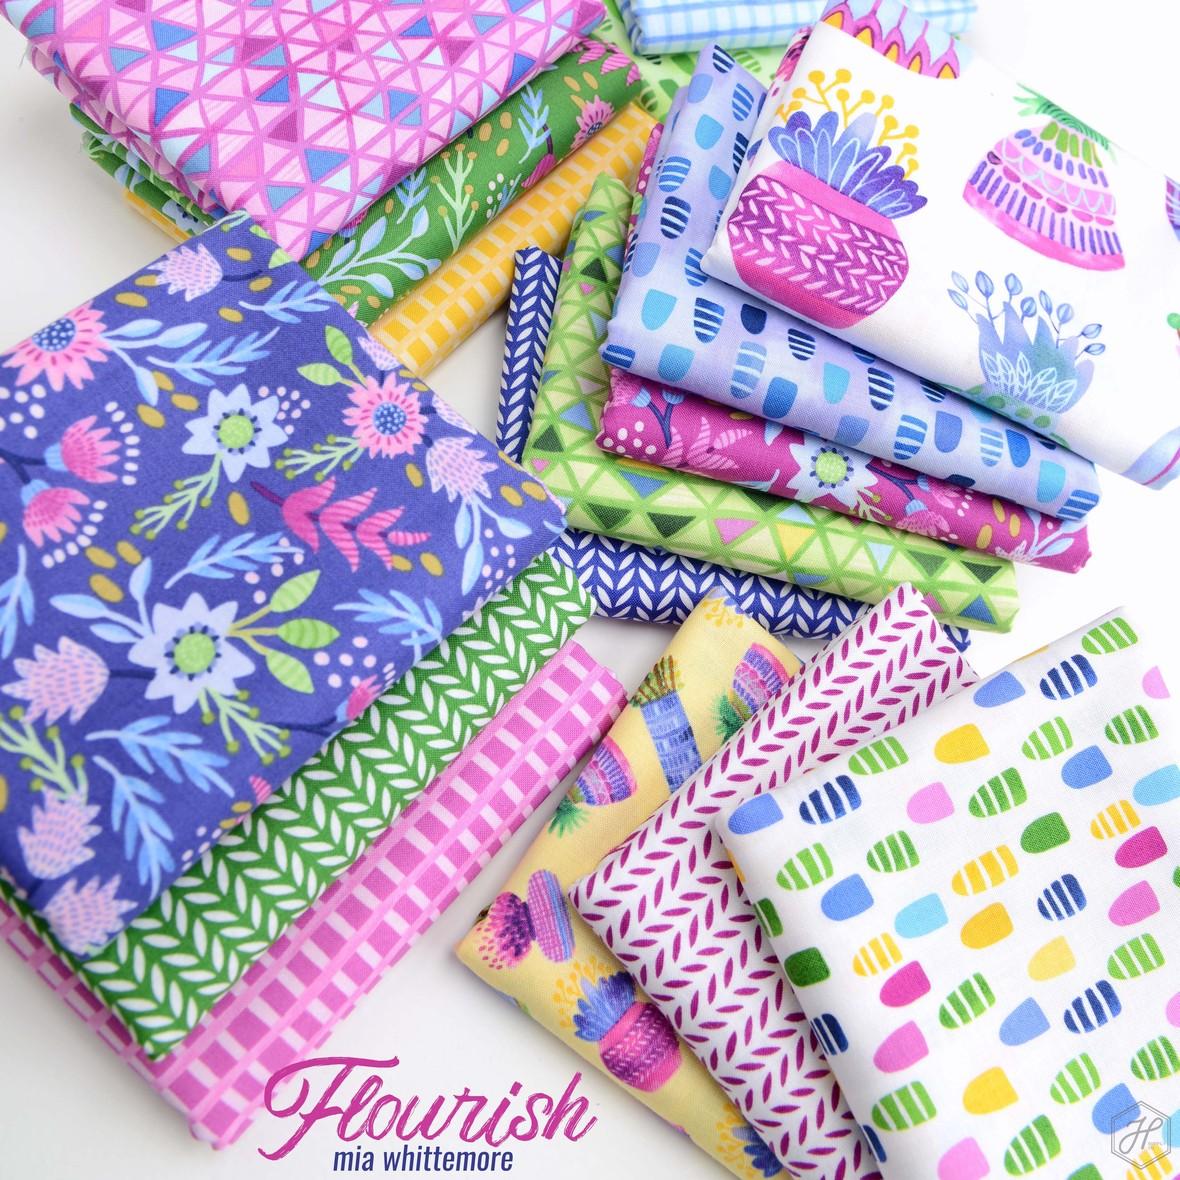 Flourish Fabric Poster Hawthorne Supply Co